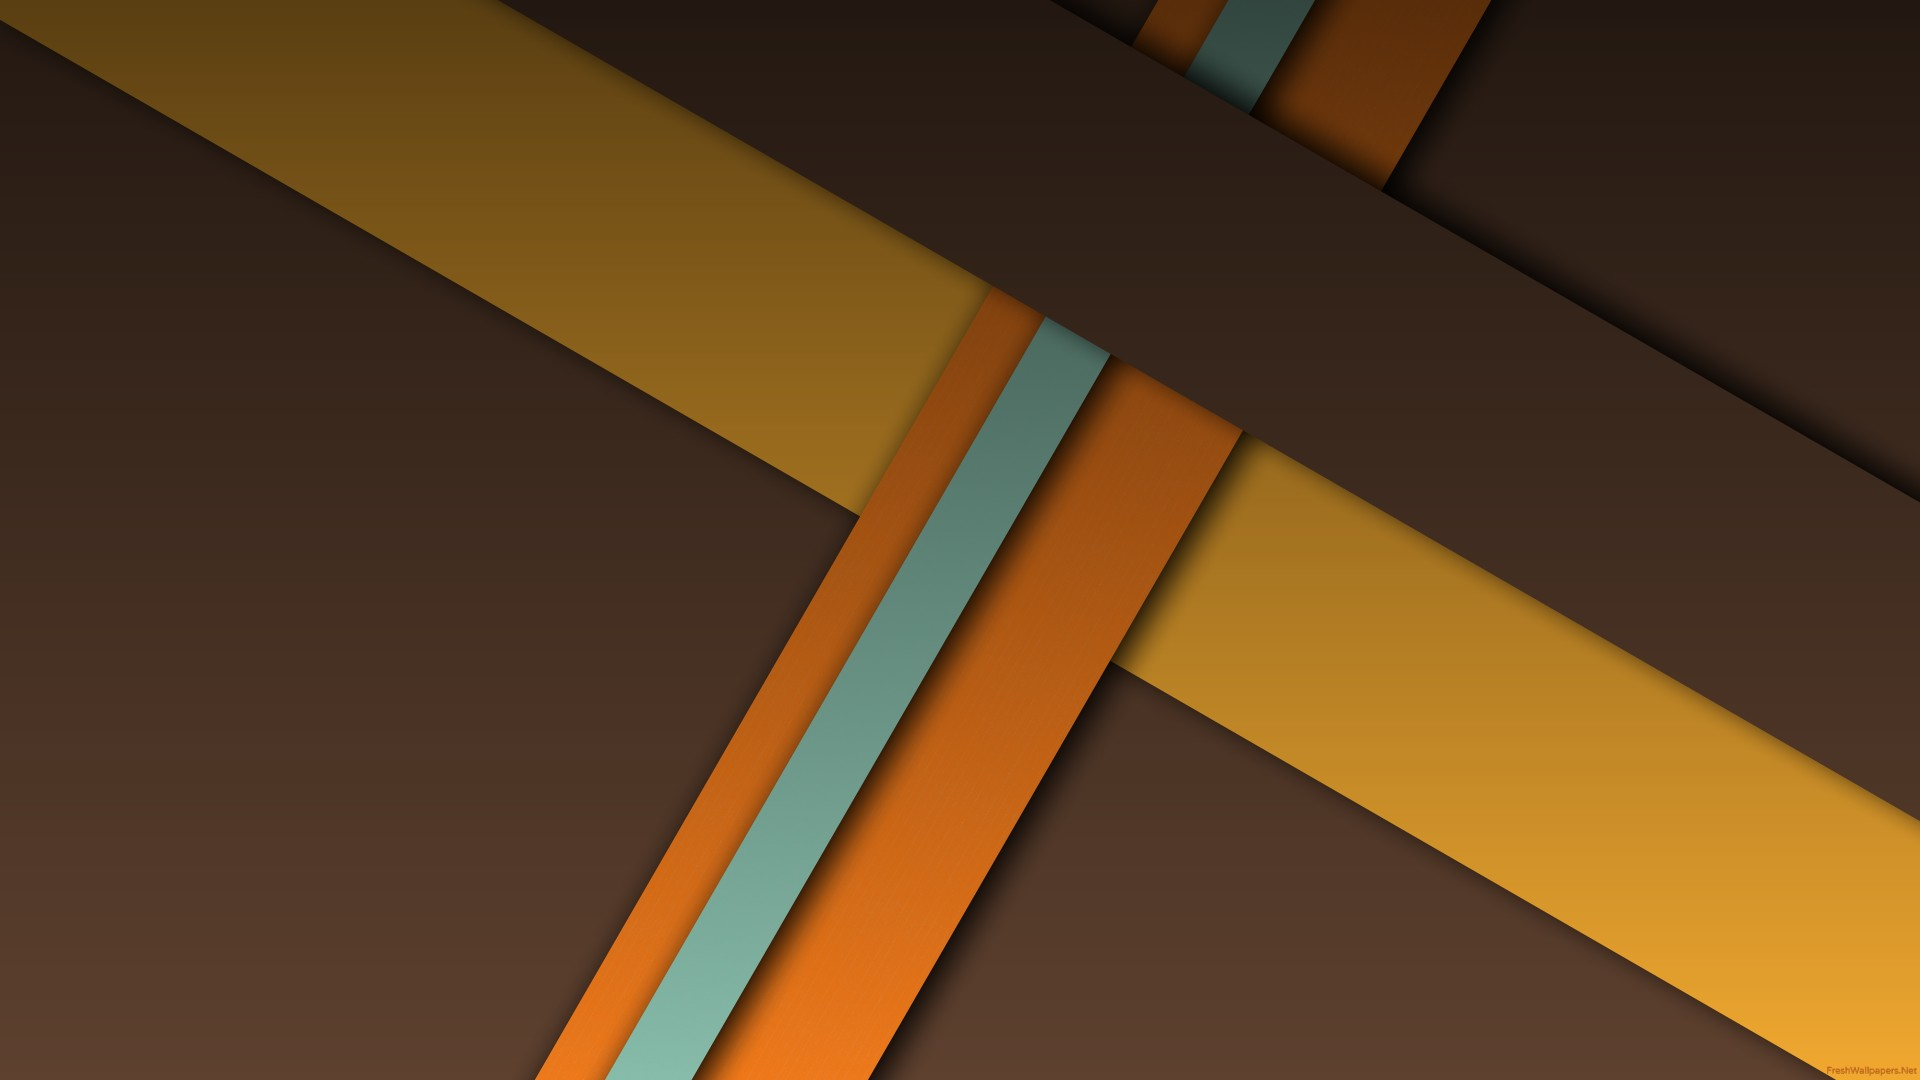 Material wallpaper ?? Download free amazing full HD wallpapers ...